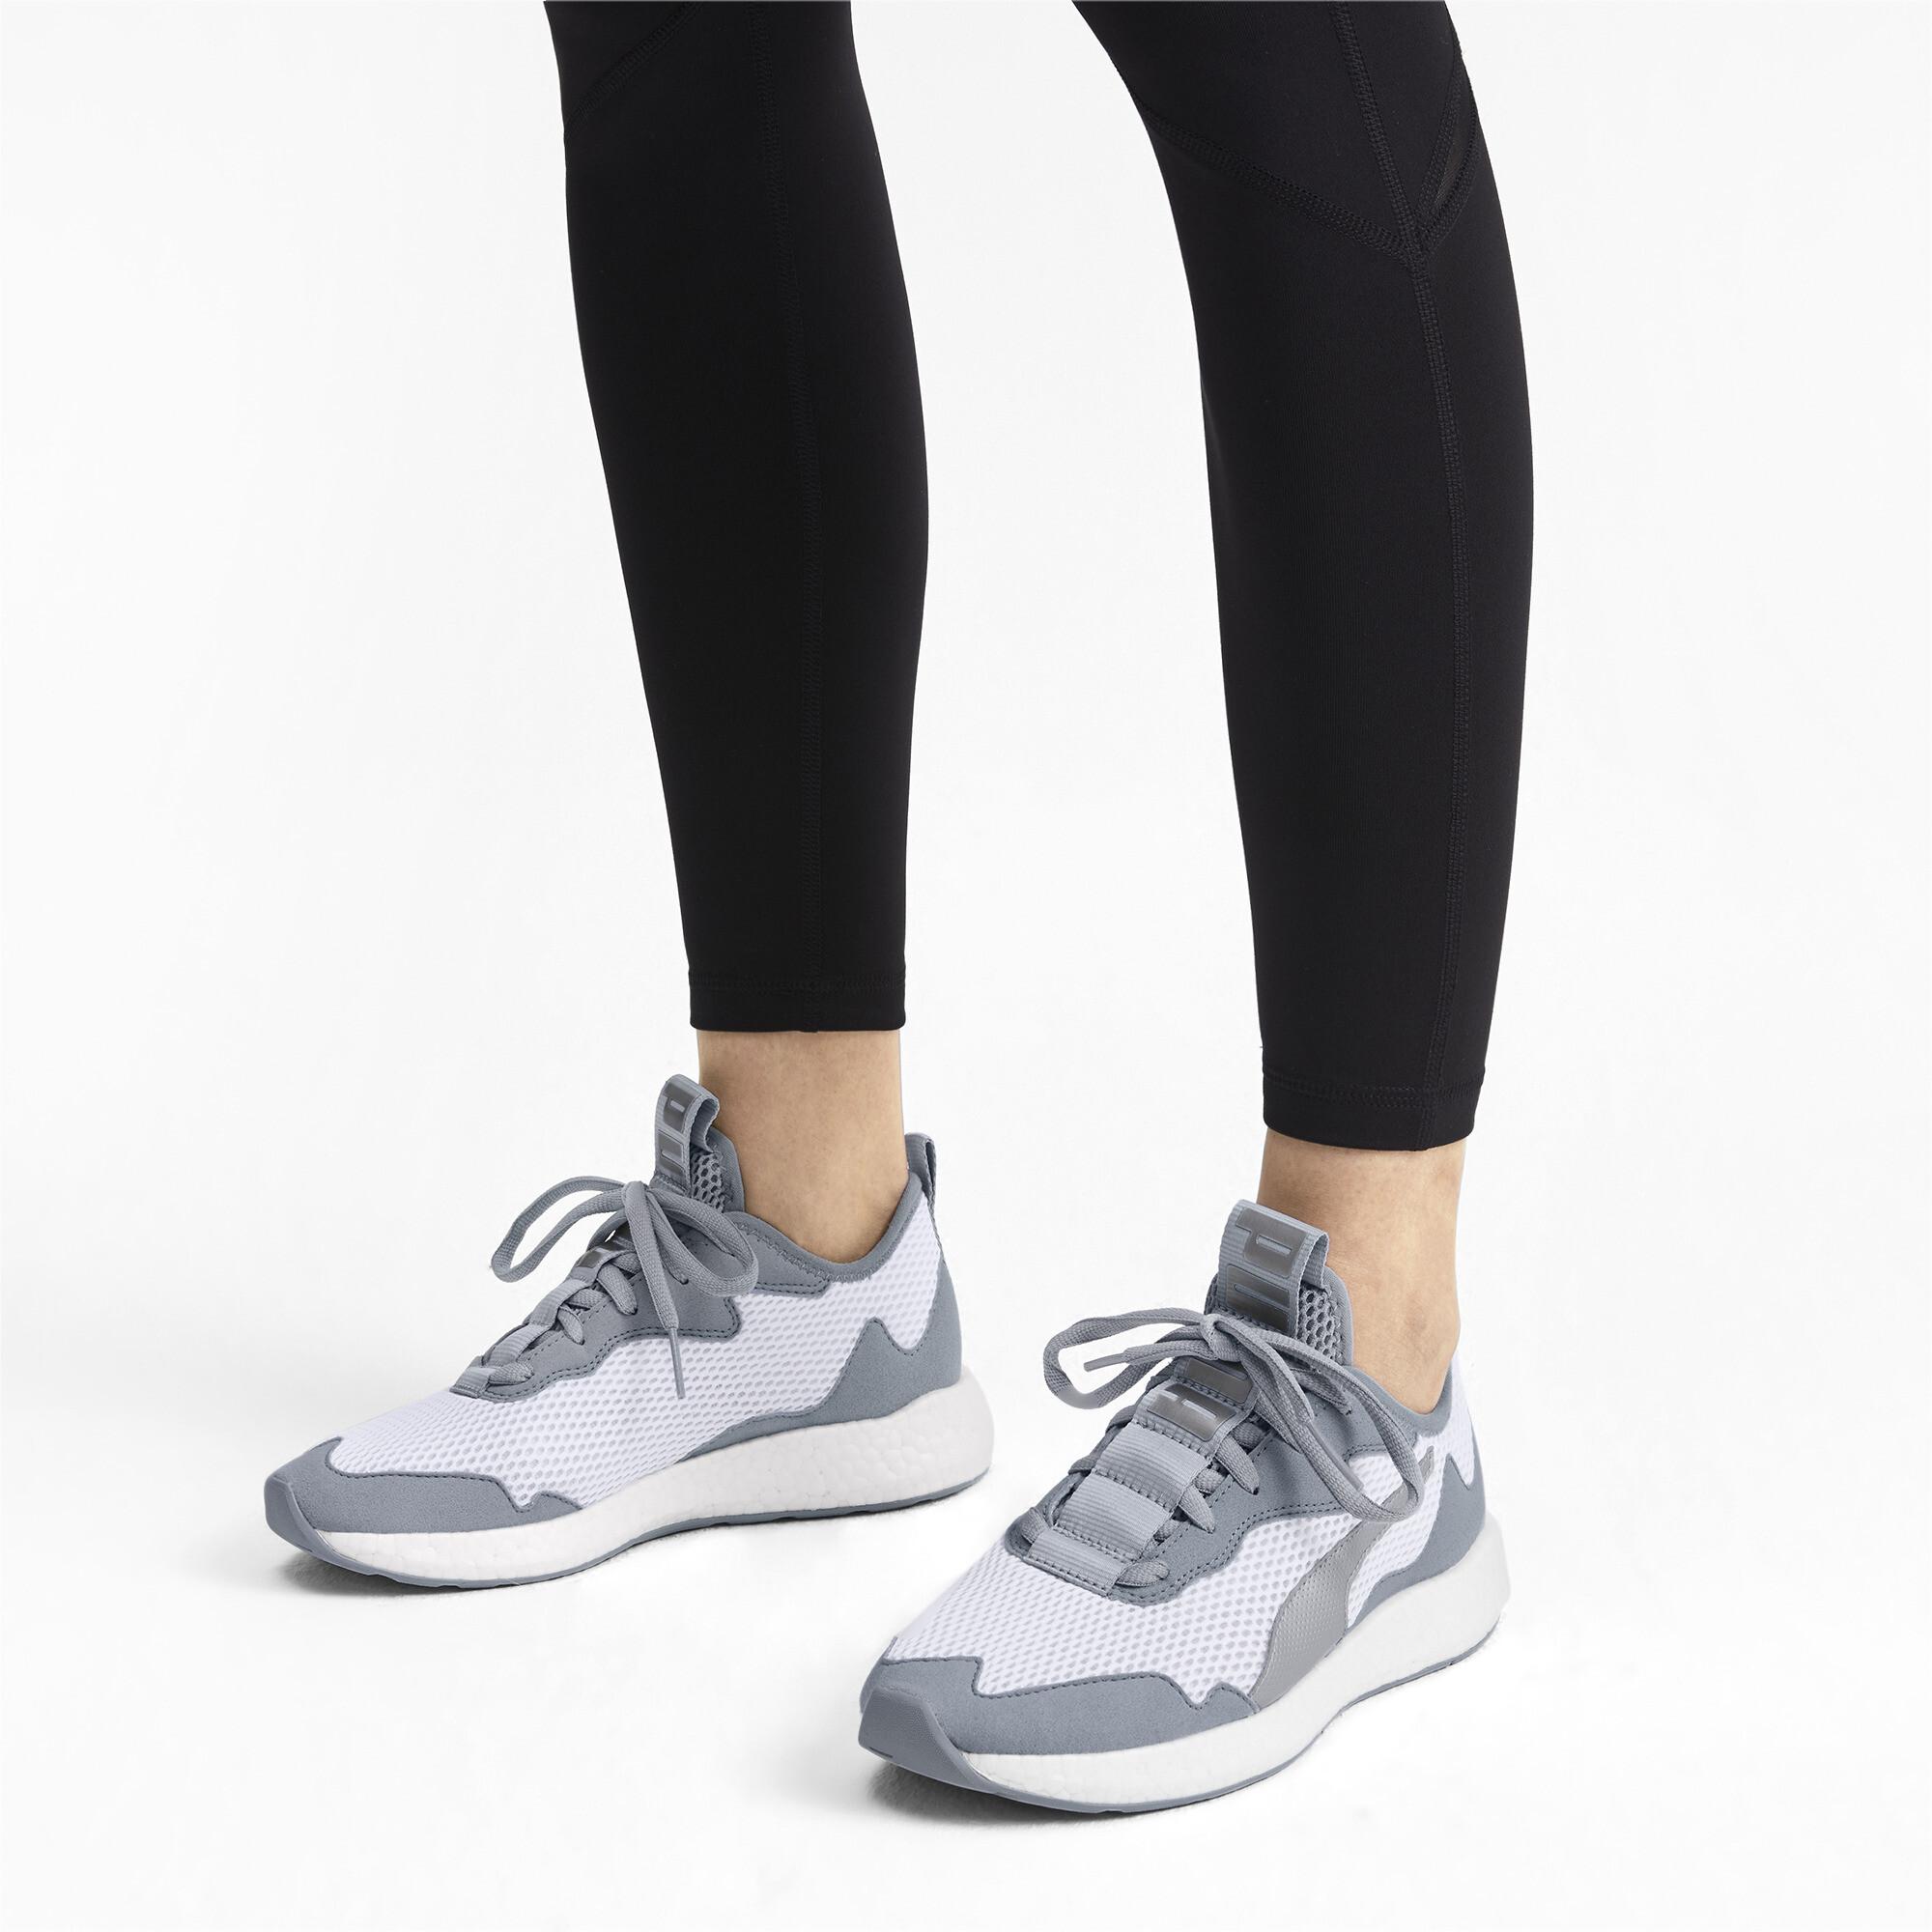 PUMA-Women-039-s-NRGY-Neko-Skim-Running-Shoes thumbnail 5